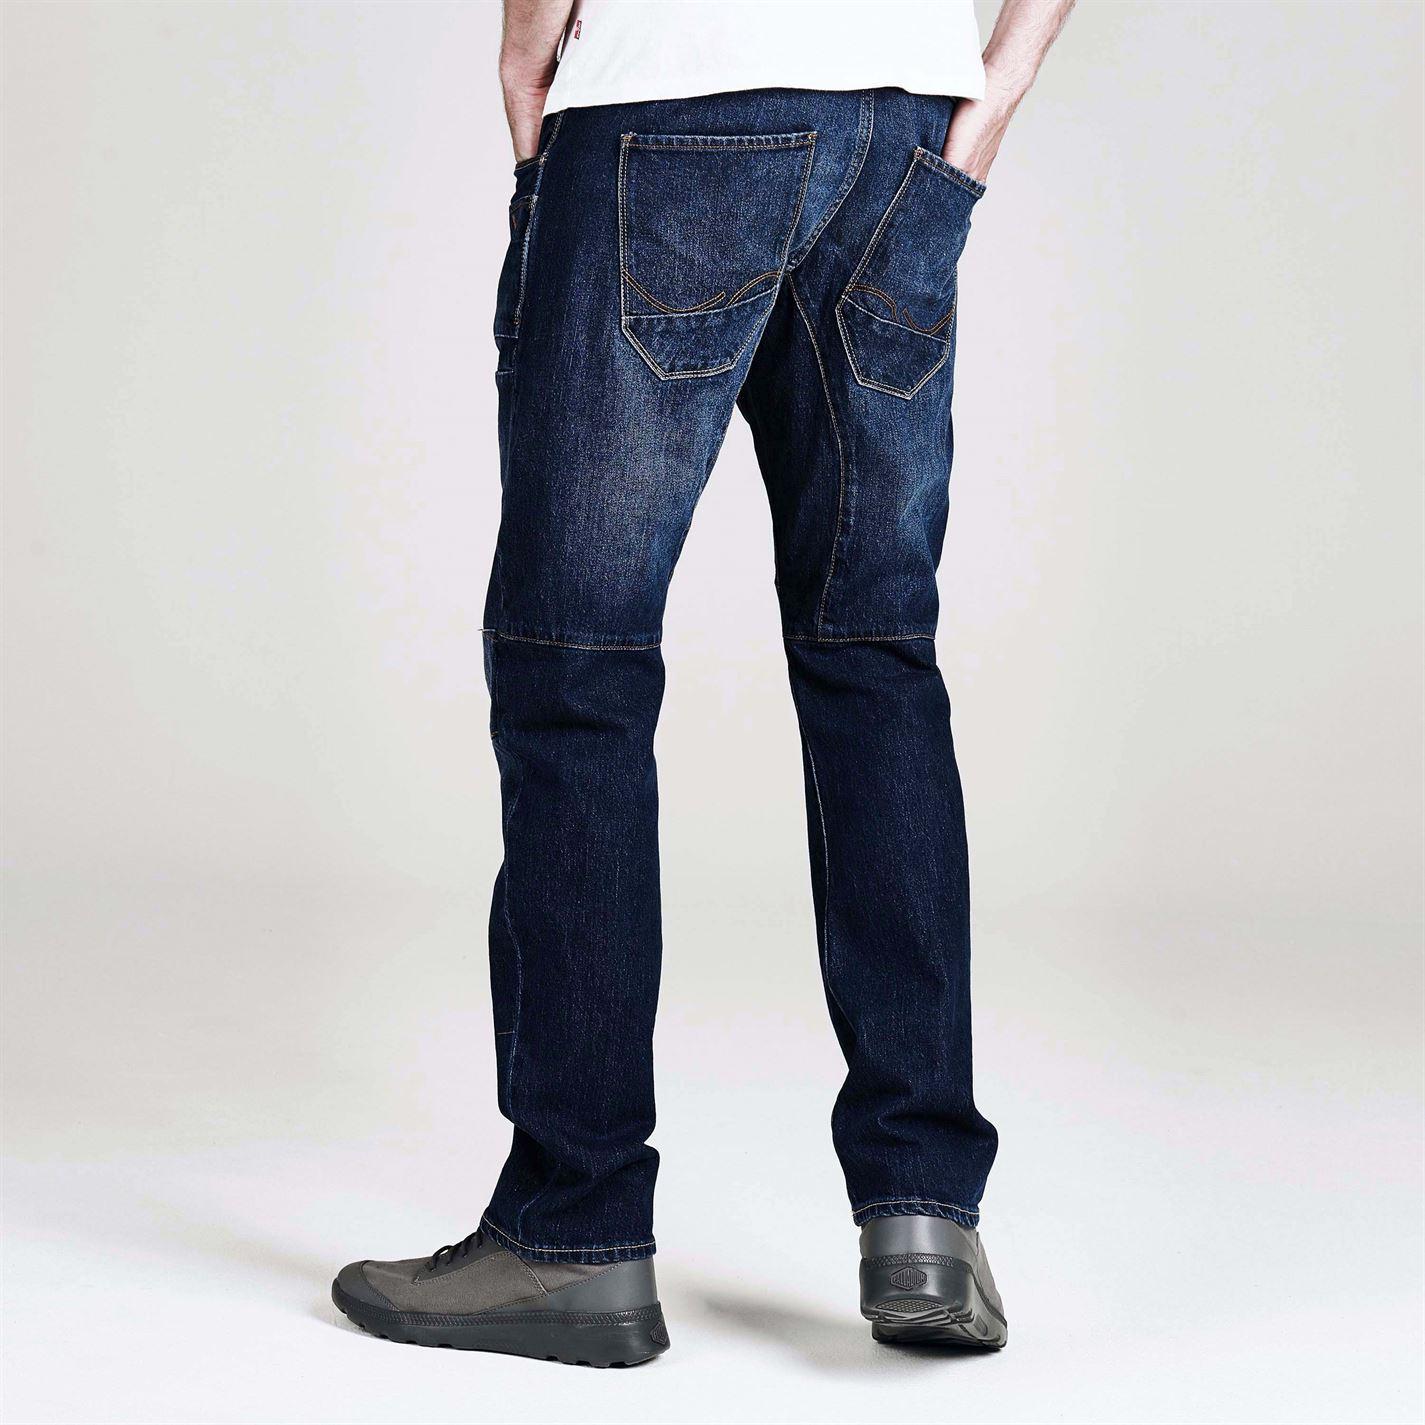 Jean-Denim-Jack-and-Jones-Stan-Osaka-Anti-Fit-de-Jean-para-Hombre-Pantalones-Pantalon-Oscuro-Wash miniatura 11